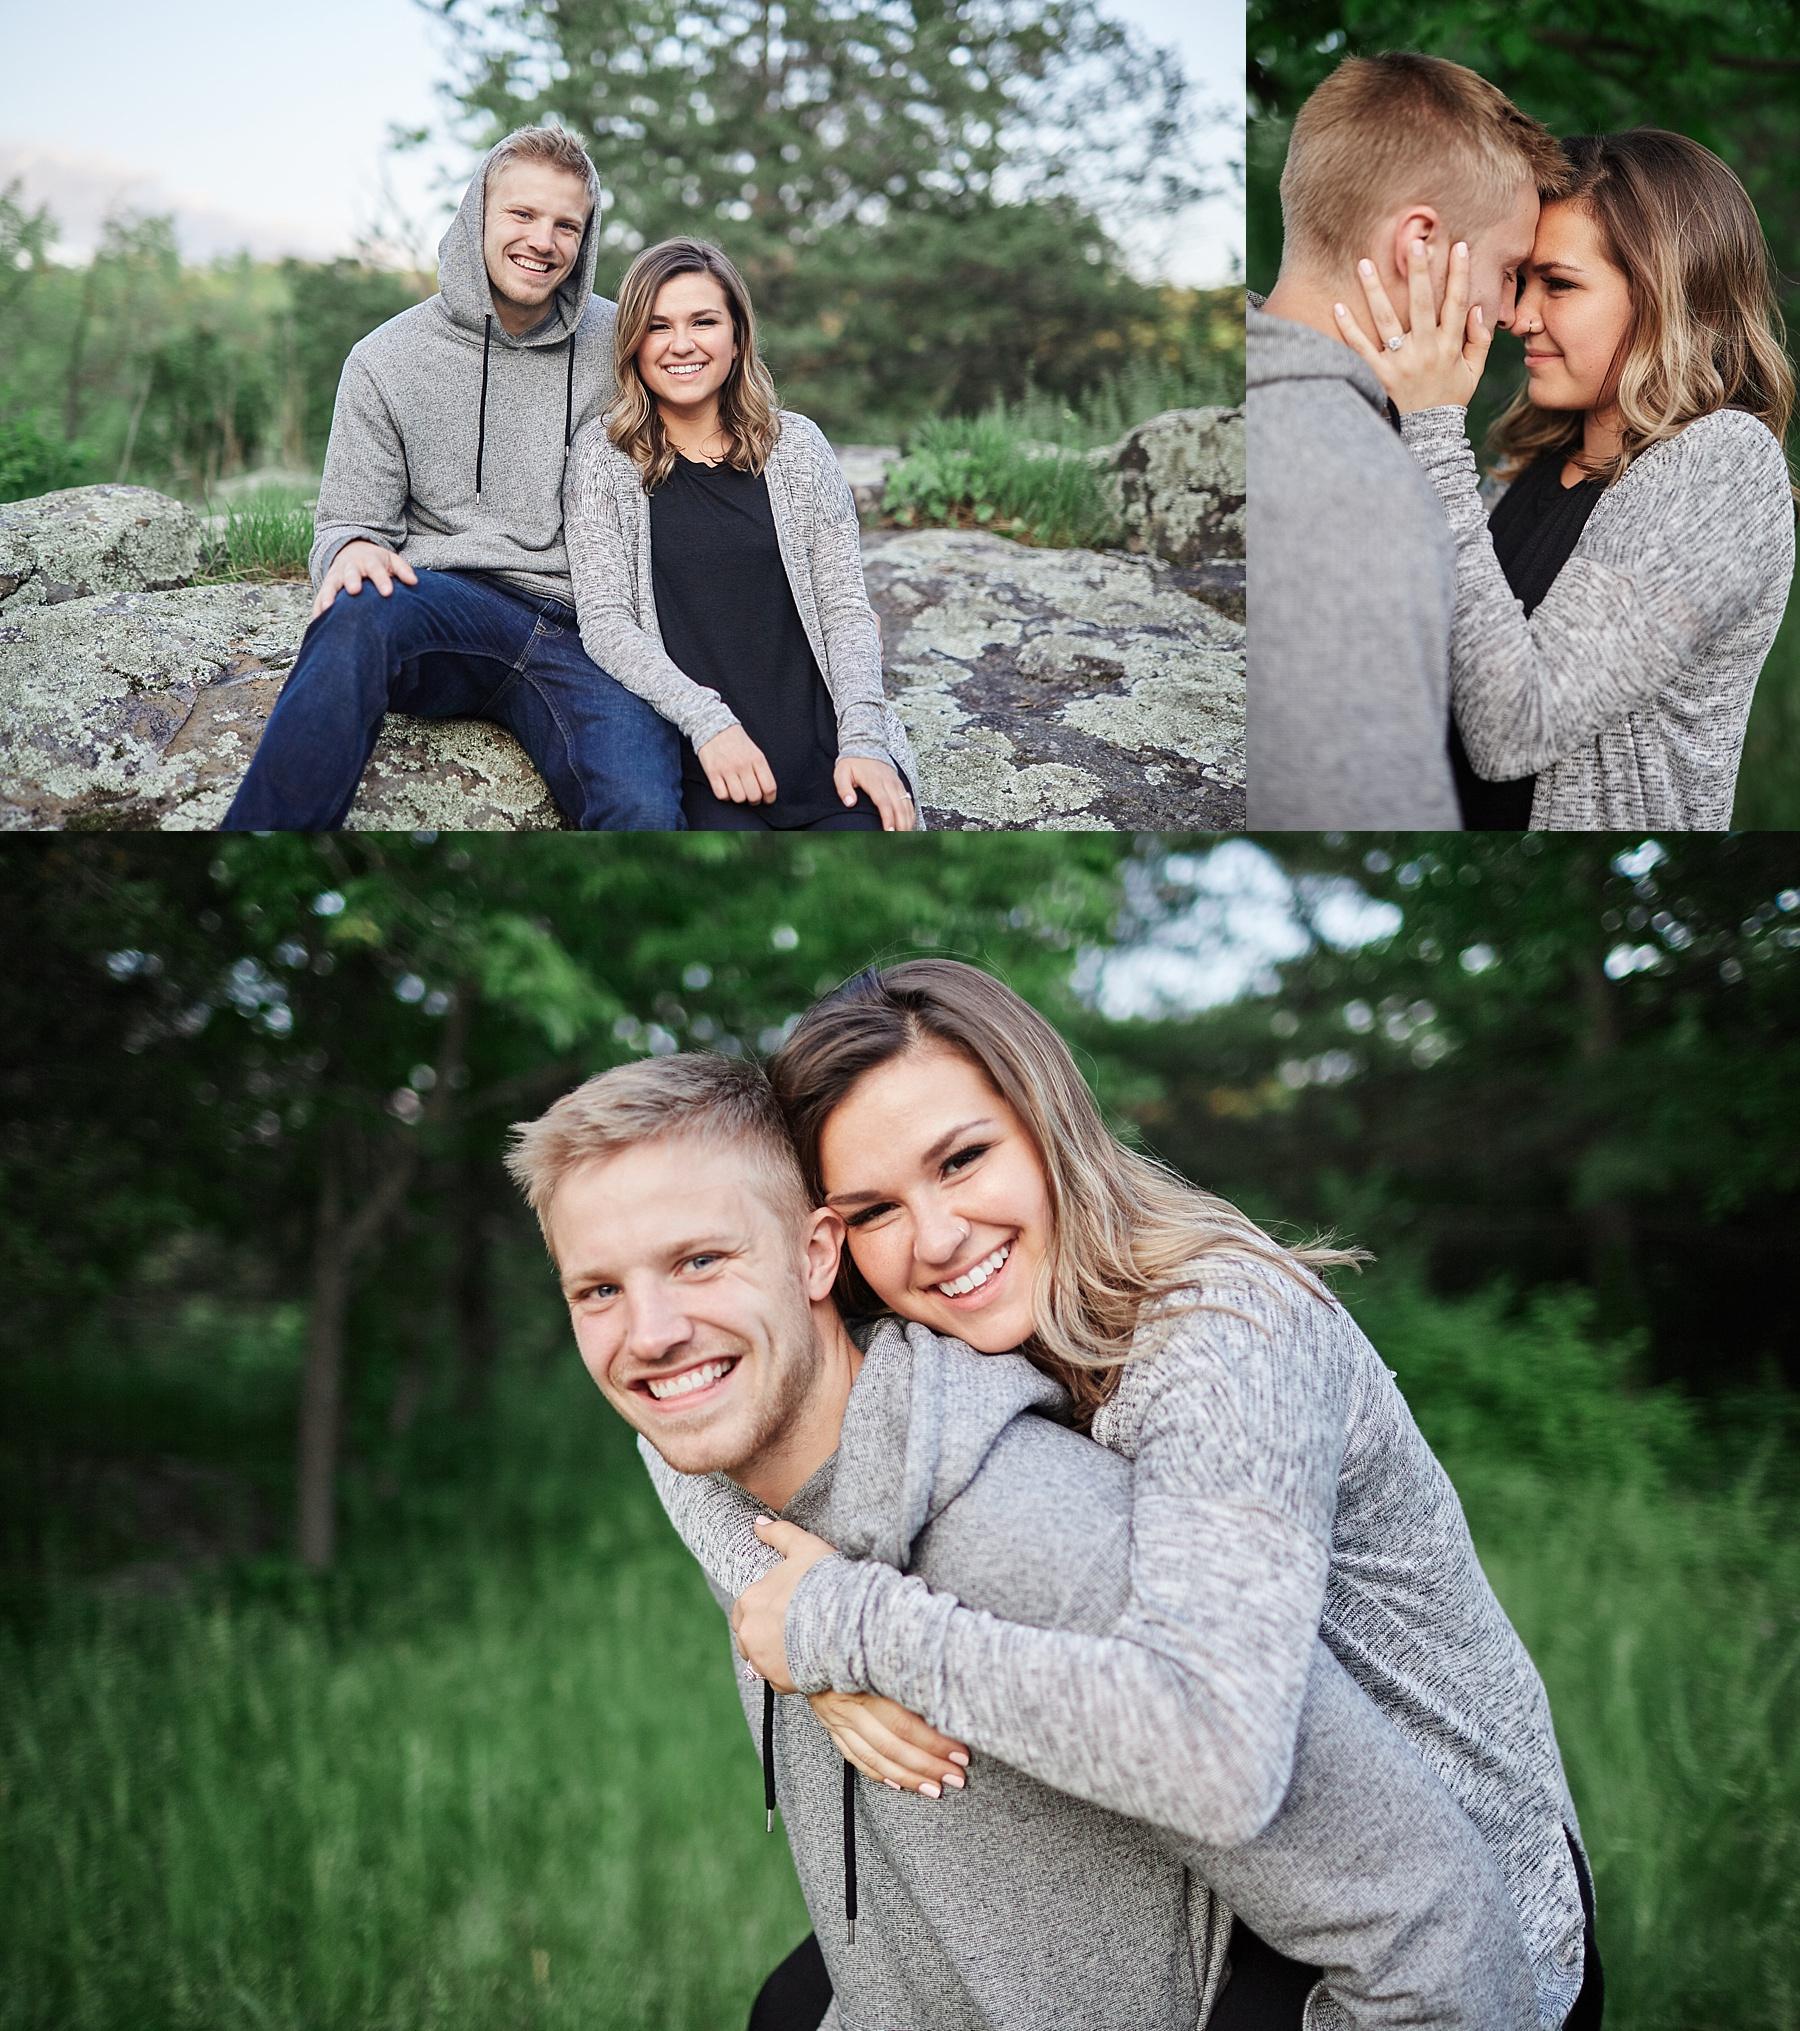 Destination-Engagement-Taylors-Falls-Minnesota-Minneapolis-Mayowood-Stone-Barn_0066.jpg